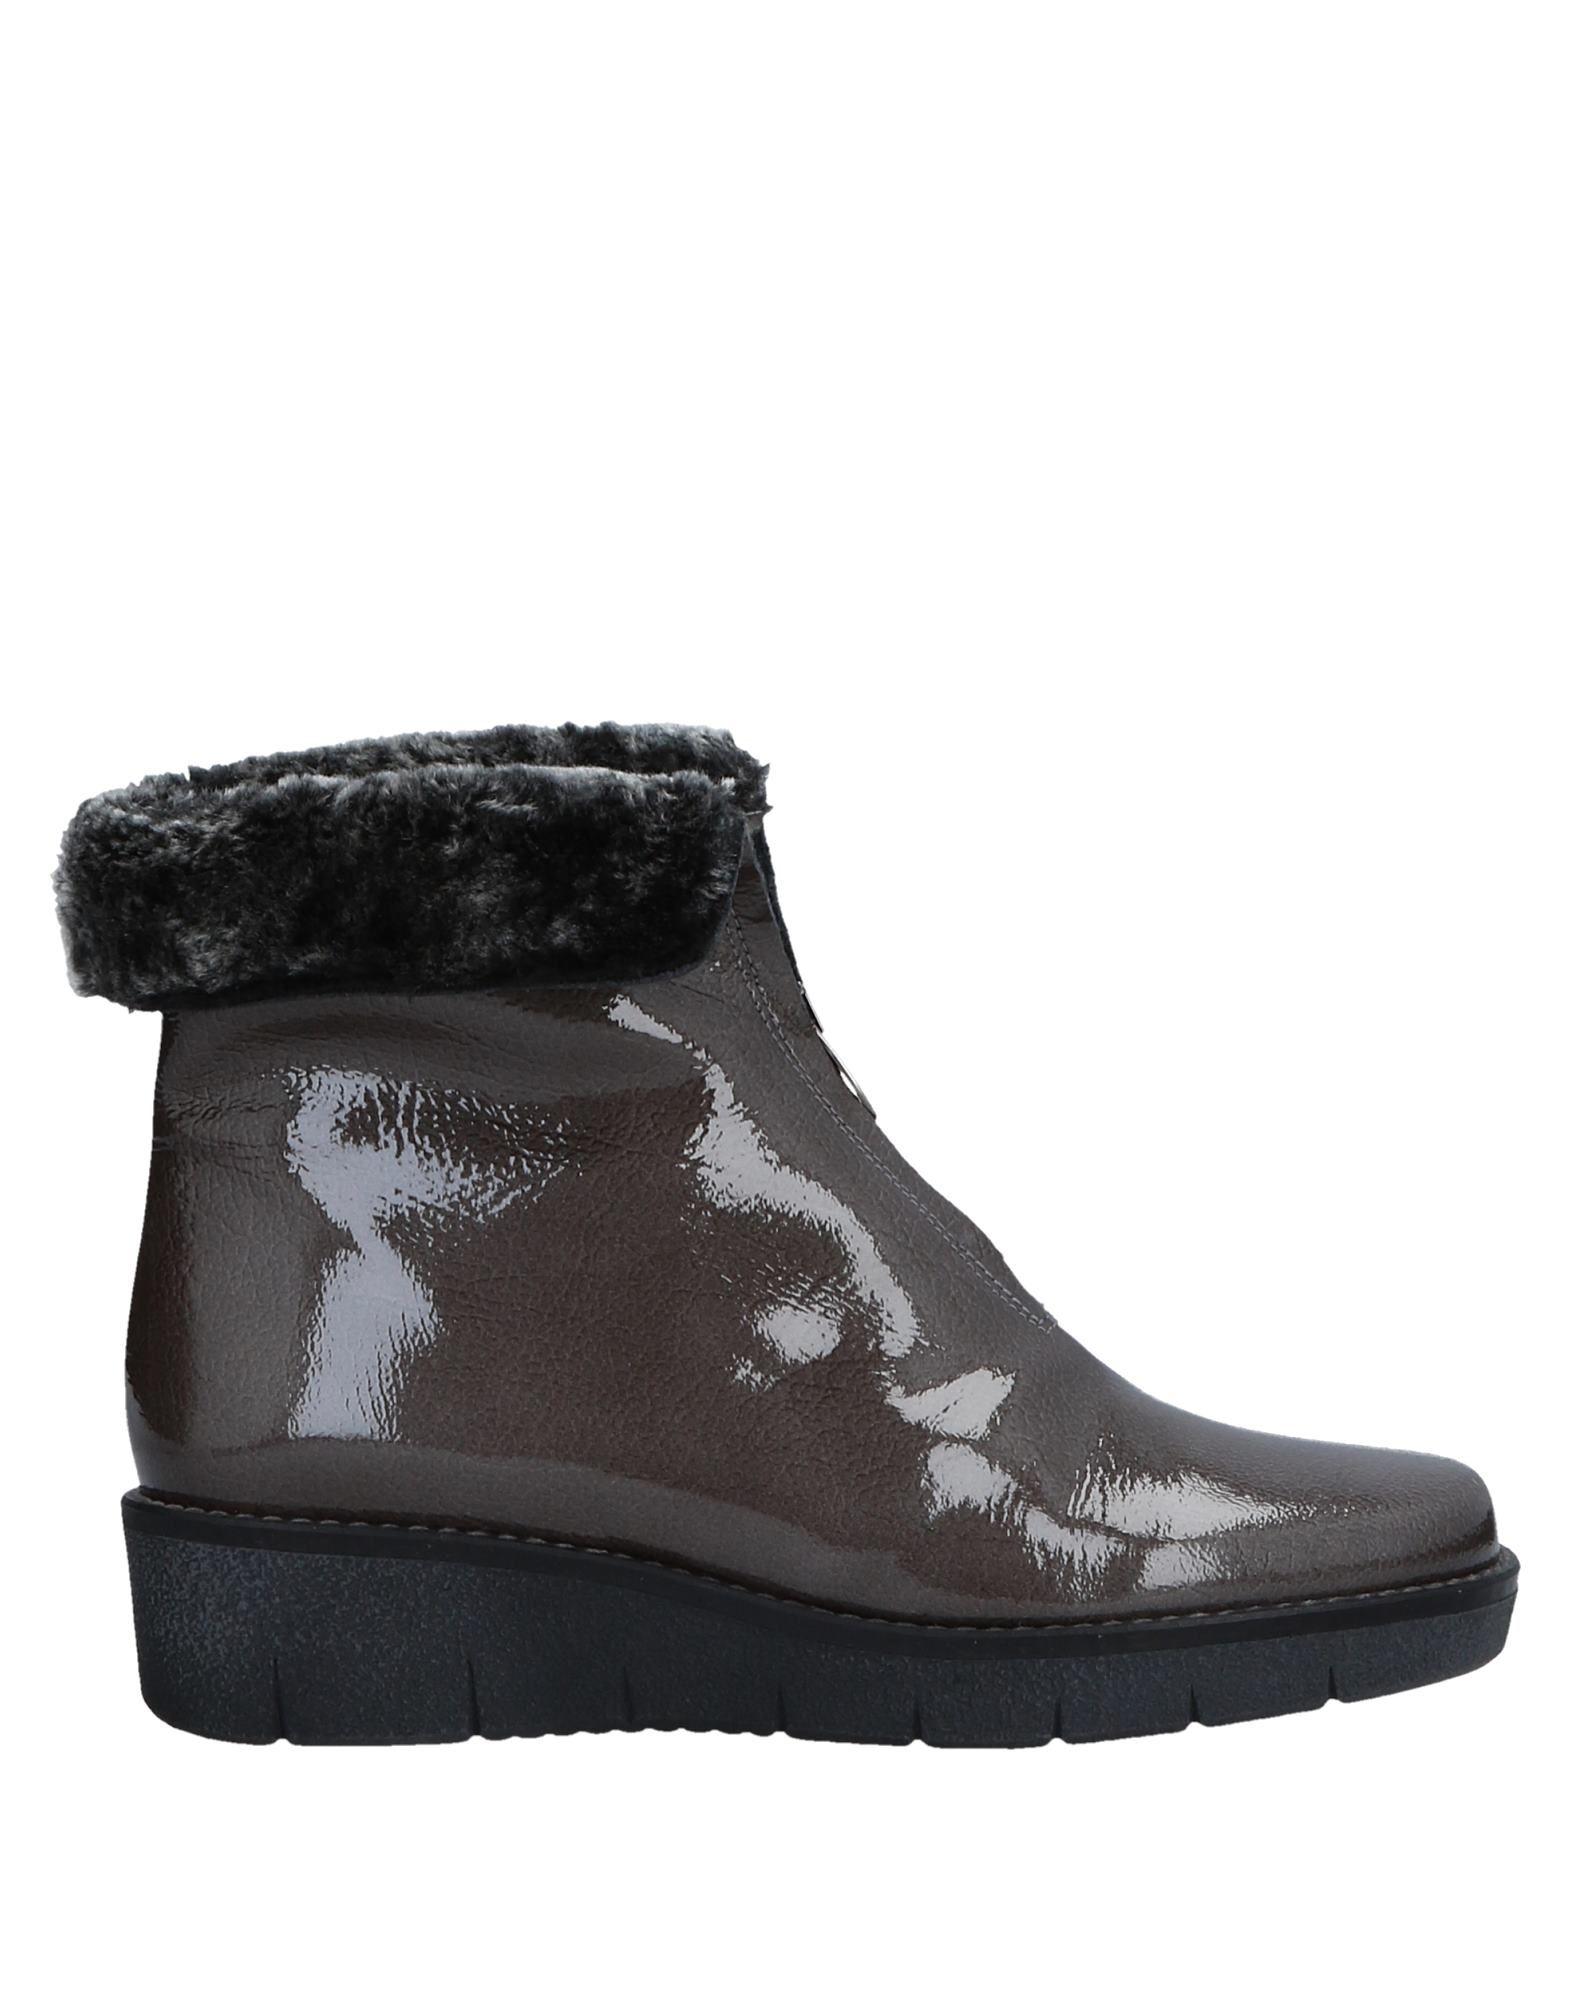 Toni 11520403VI Pons Stiefelette Damen  11520403VI Toni Gute Qualität beliebte Schuhe c6f189